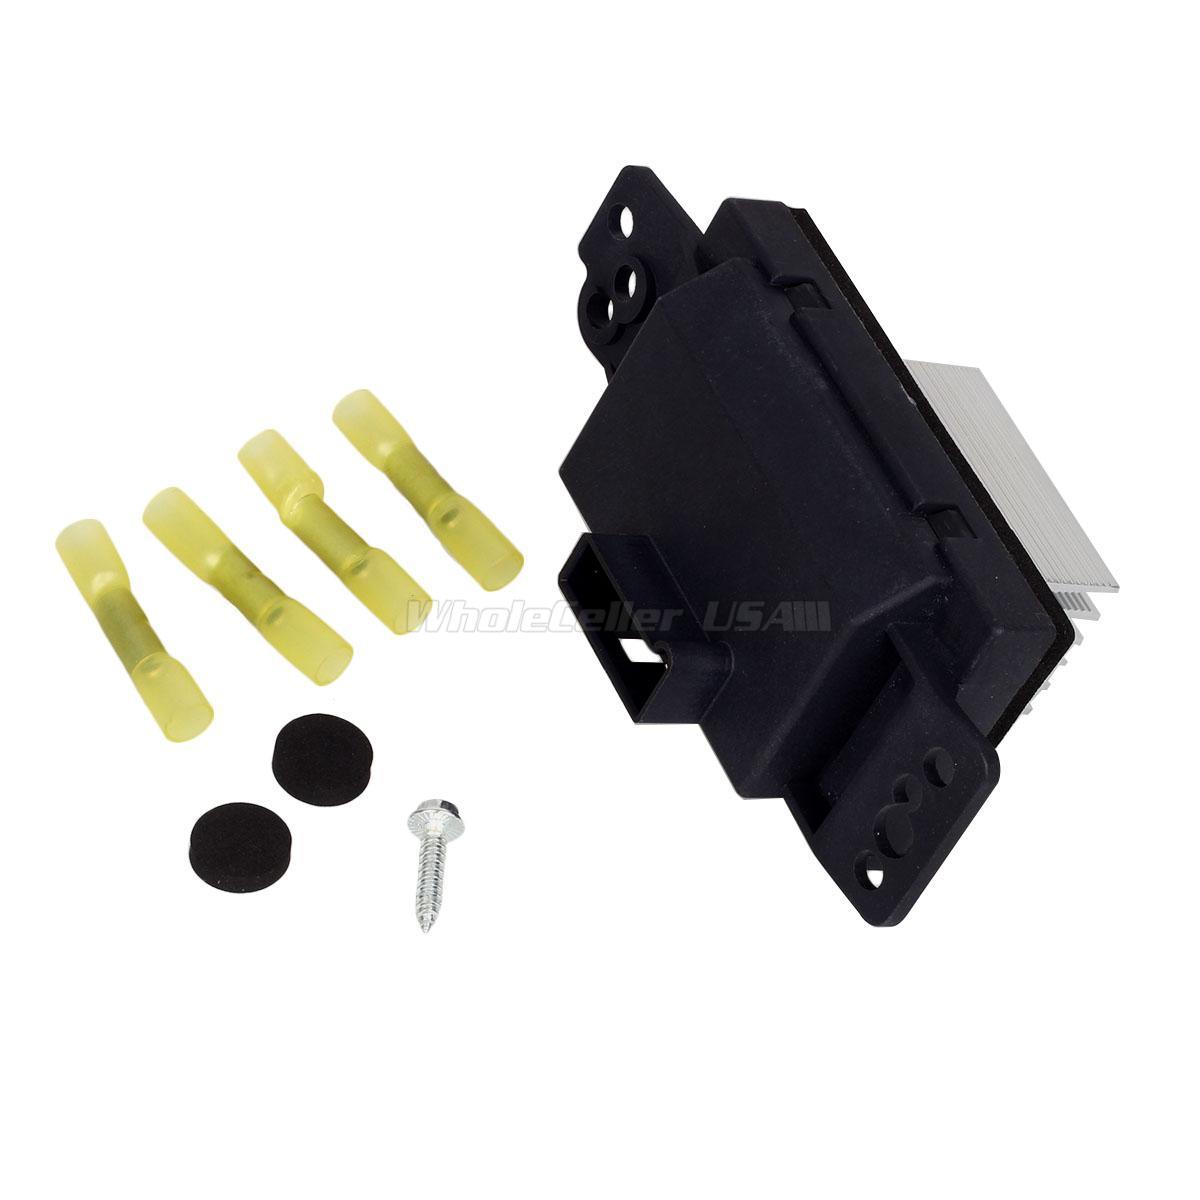 Chevy Impala Blower Motor Resistor: Blower Motor Resistor For Chevrolet 04-13 Impala 04-07